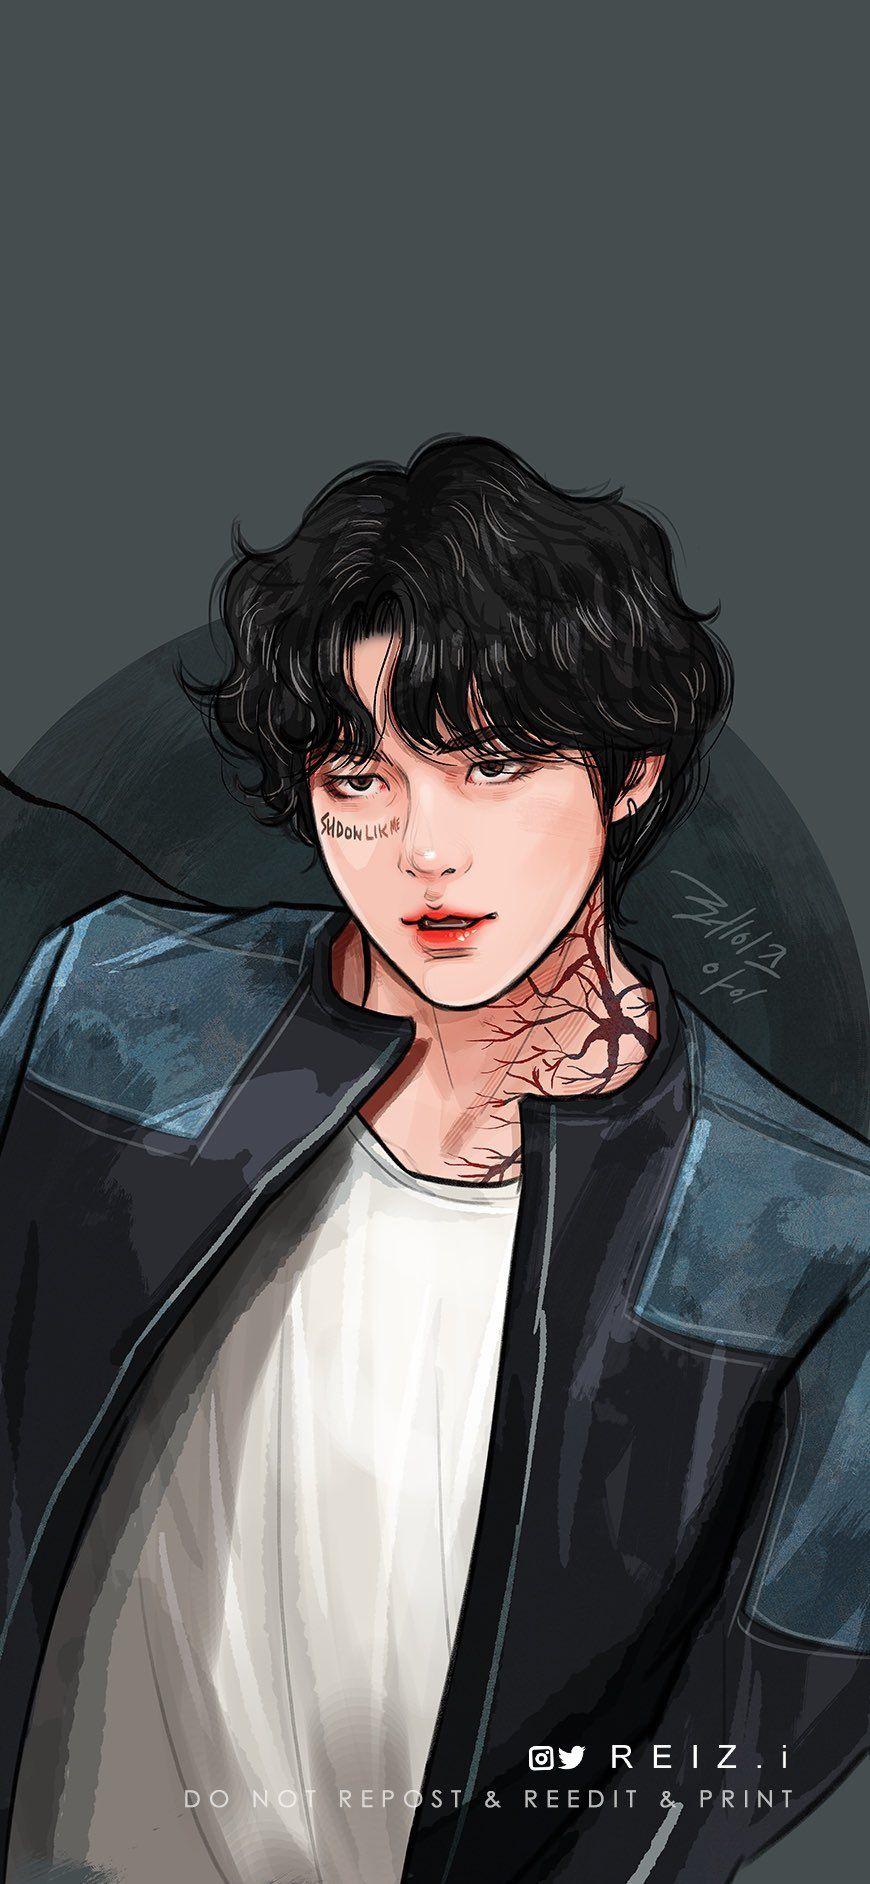 Reiz I On Twitter Bts Fanart Taehyung Fanart Illustration Art Wallpaper